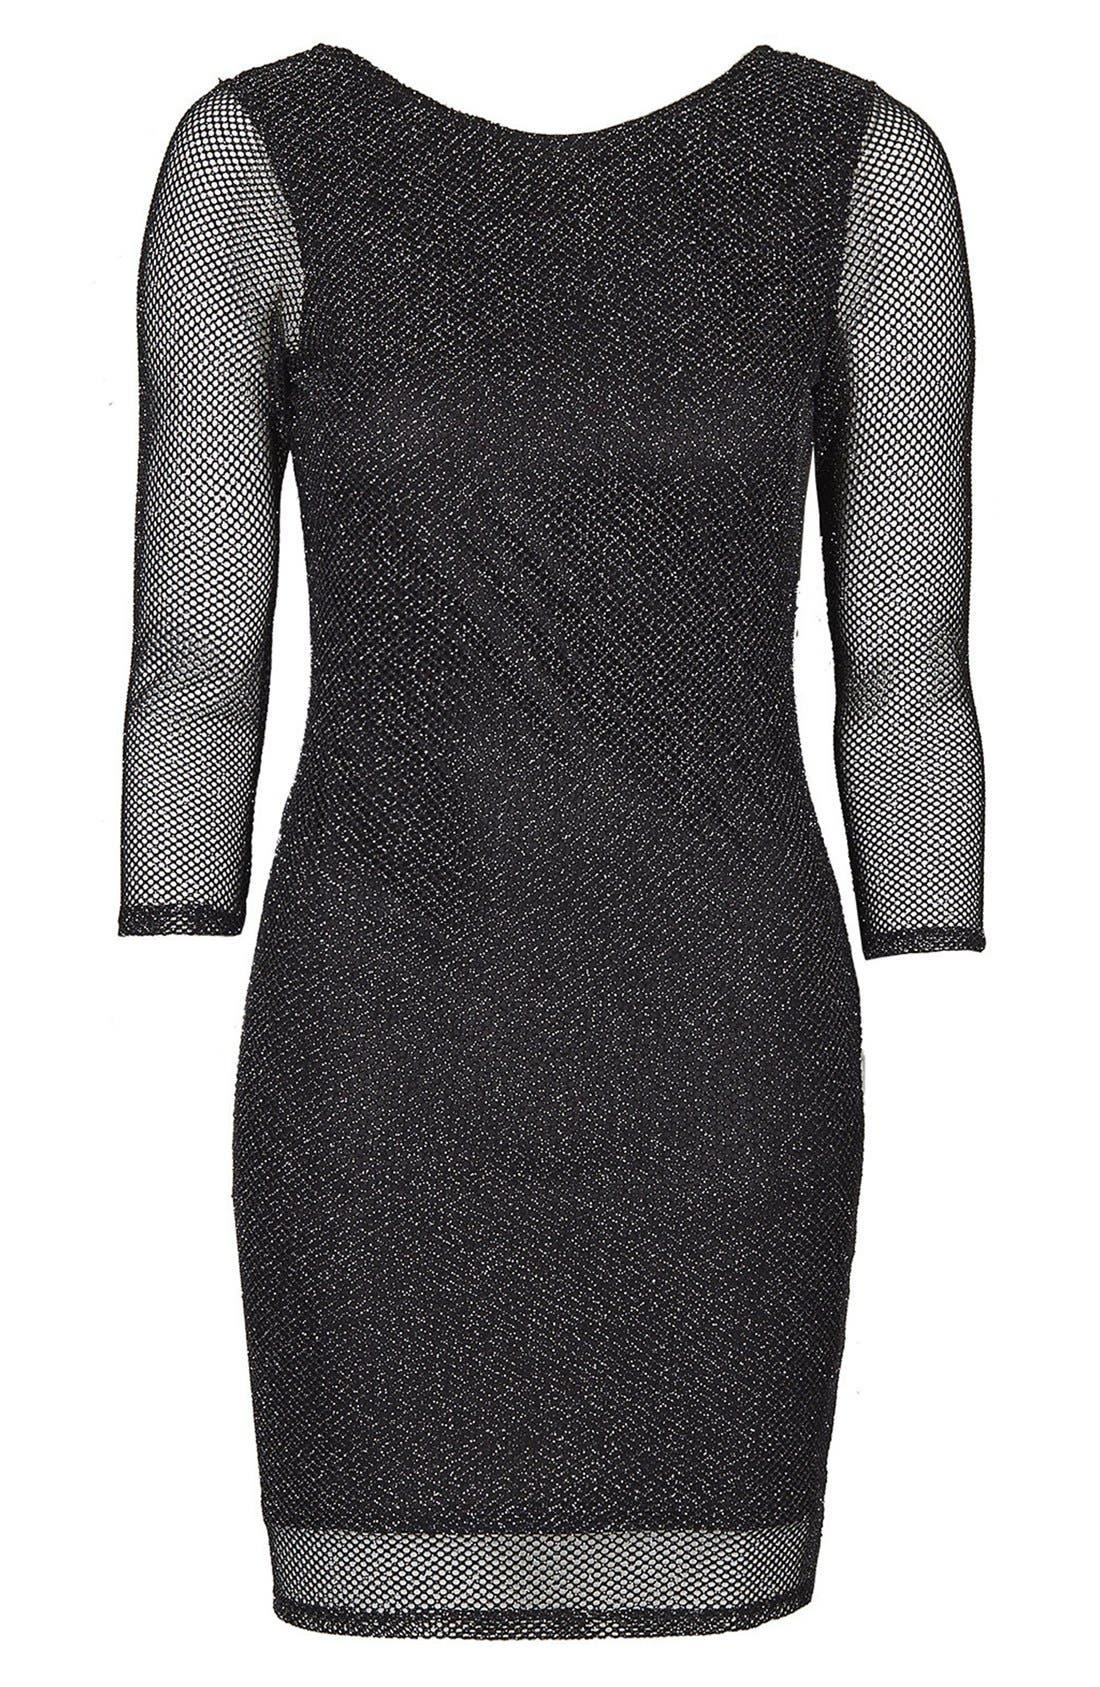 Alternate Image 3  - Topshop Glitter Mesh Body-Con Dress